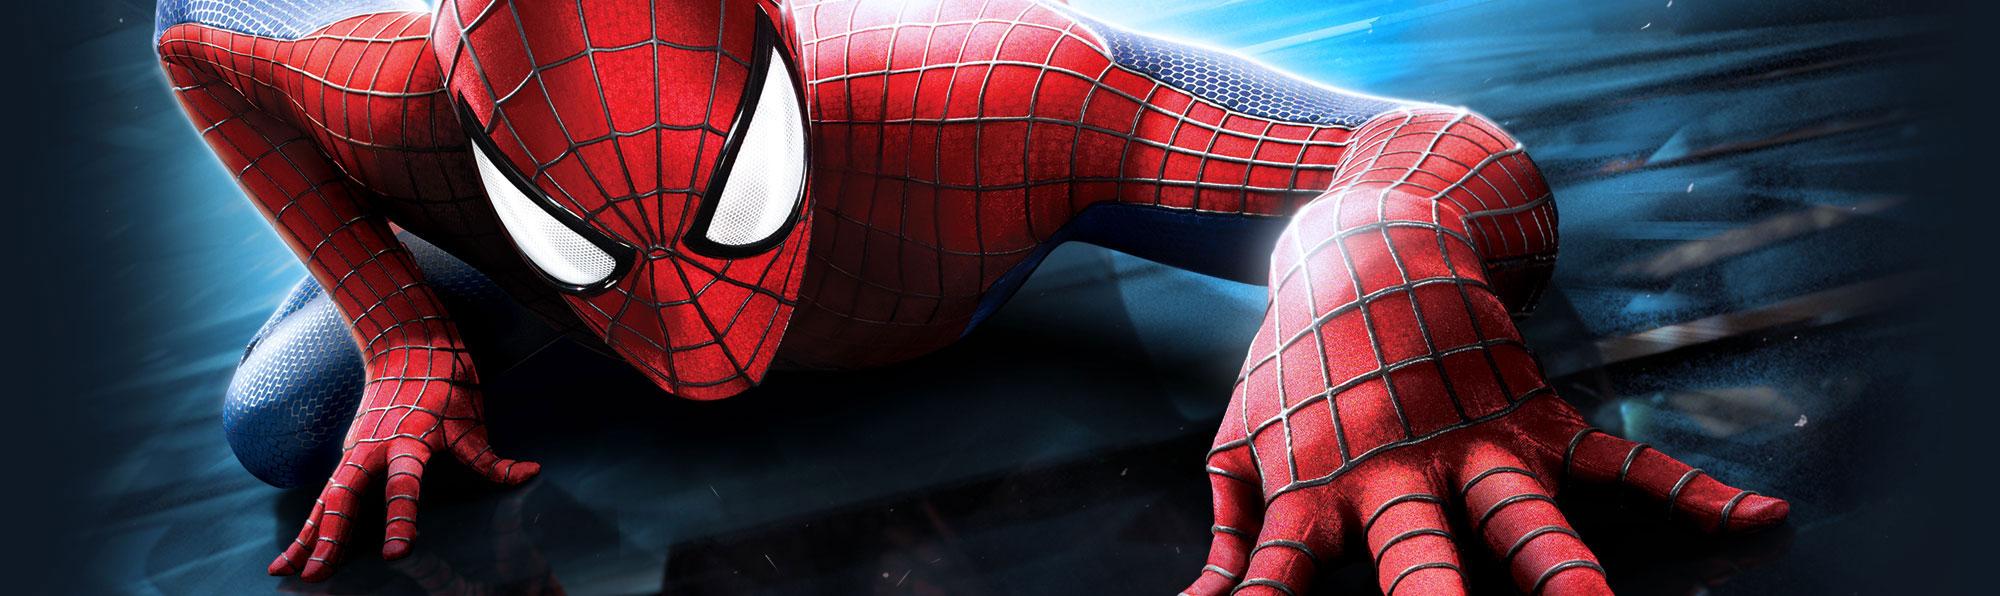 header-background-spiderman-promotionnelle